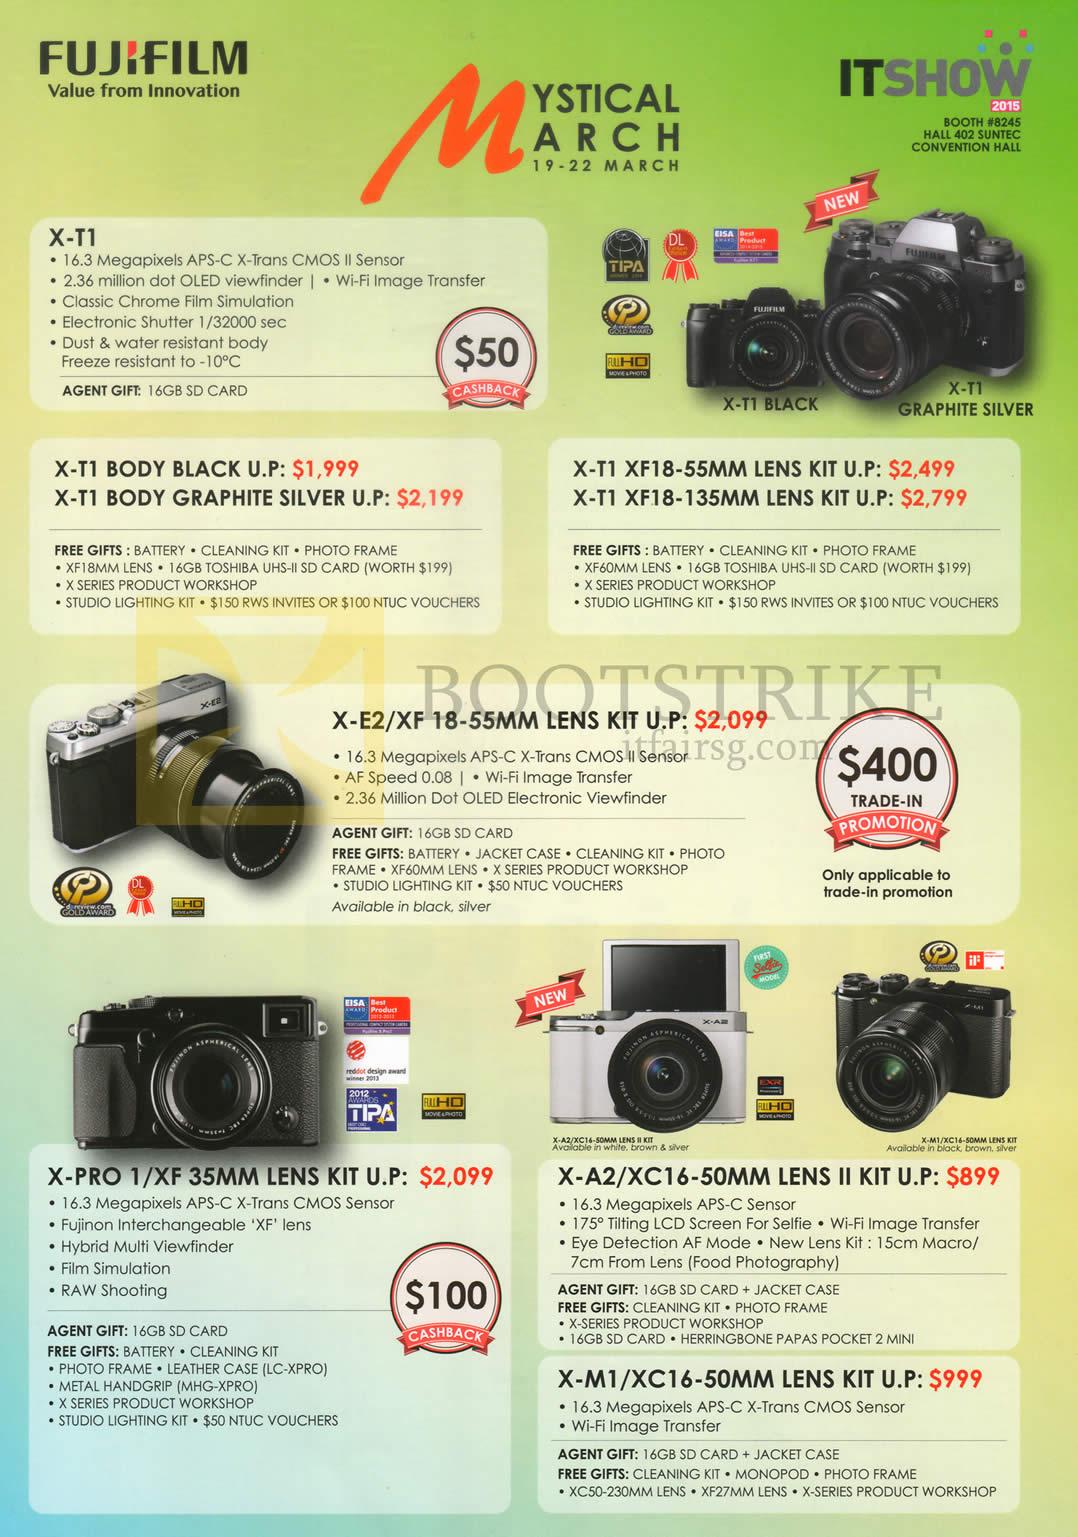 Fujifilm Digital Cameras X-T1, X-E2, X-Pro 1, X-A2, X-M1